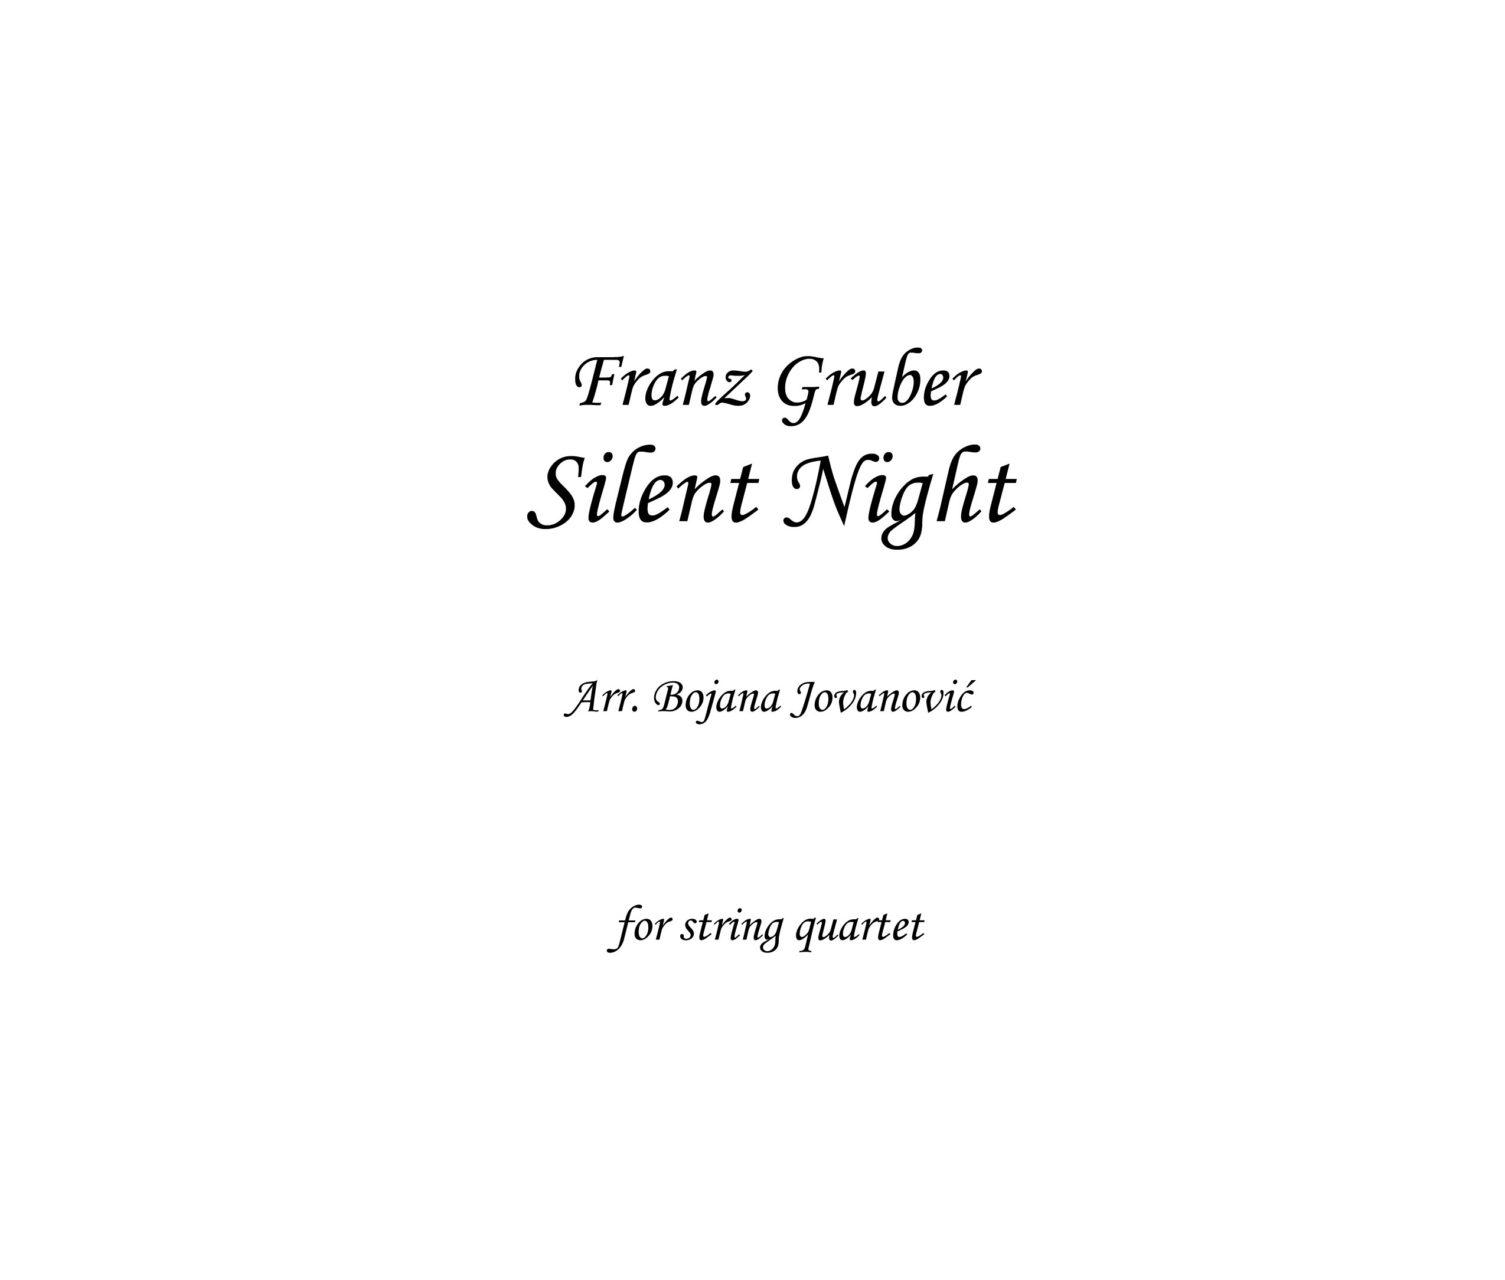 Silent Night (Christmas song) - Sheet Music